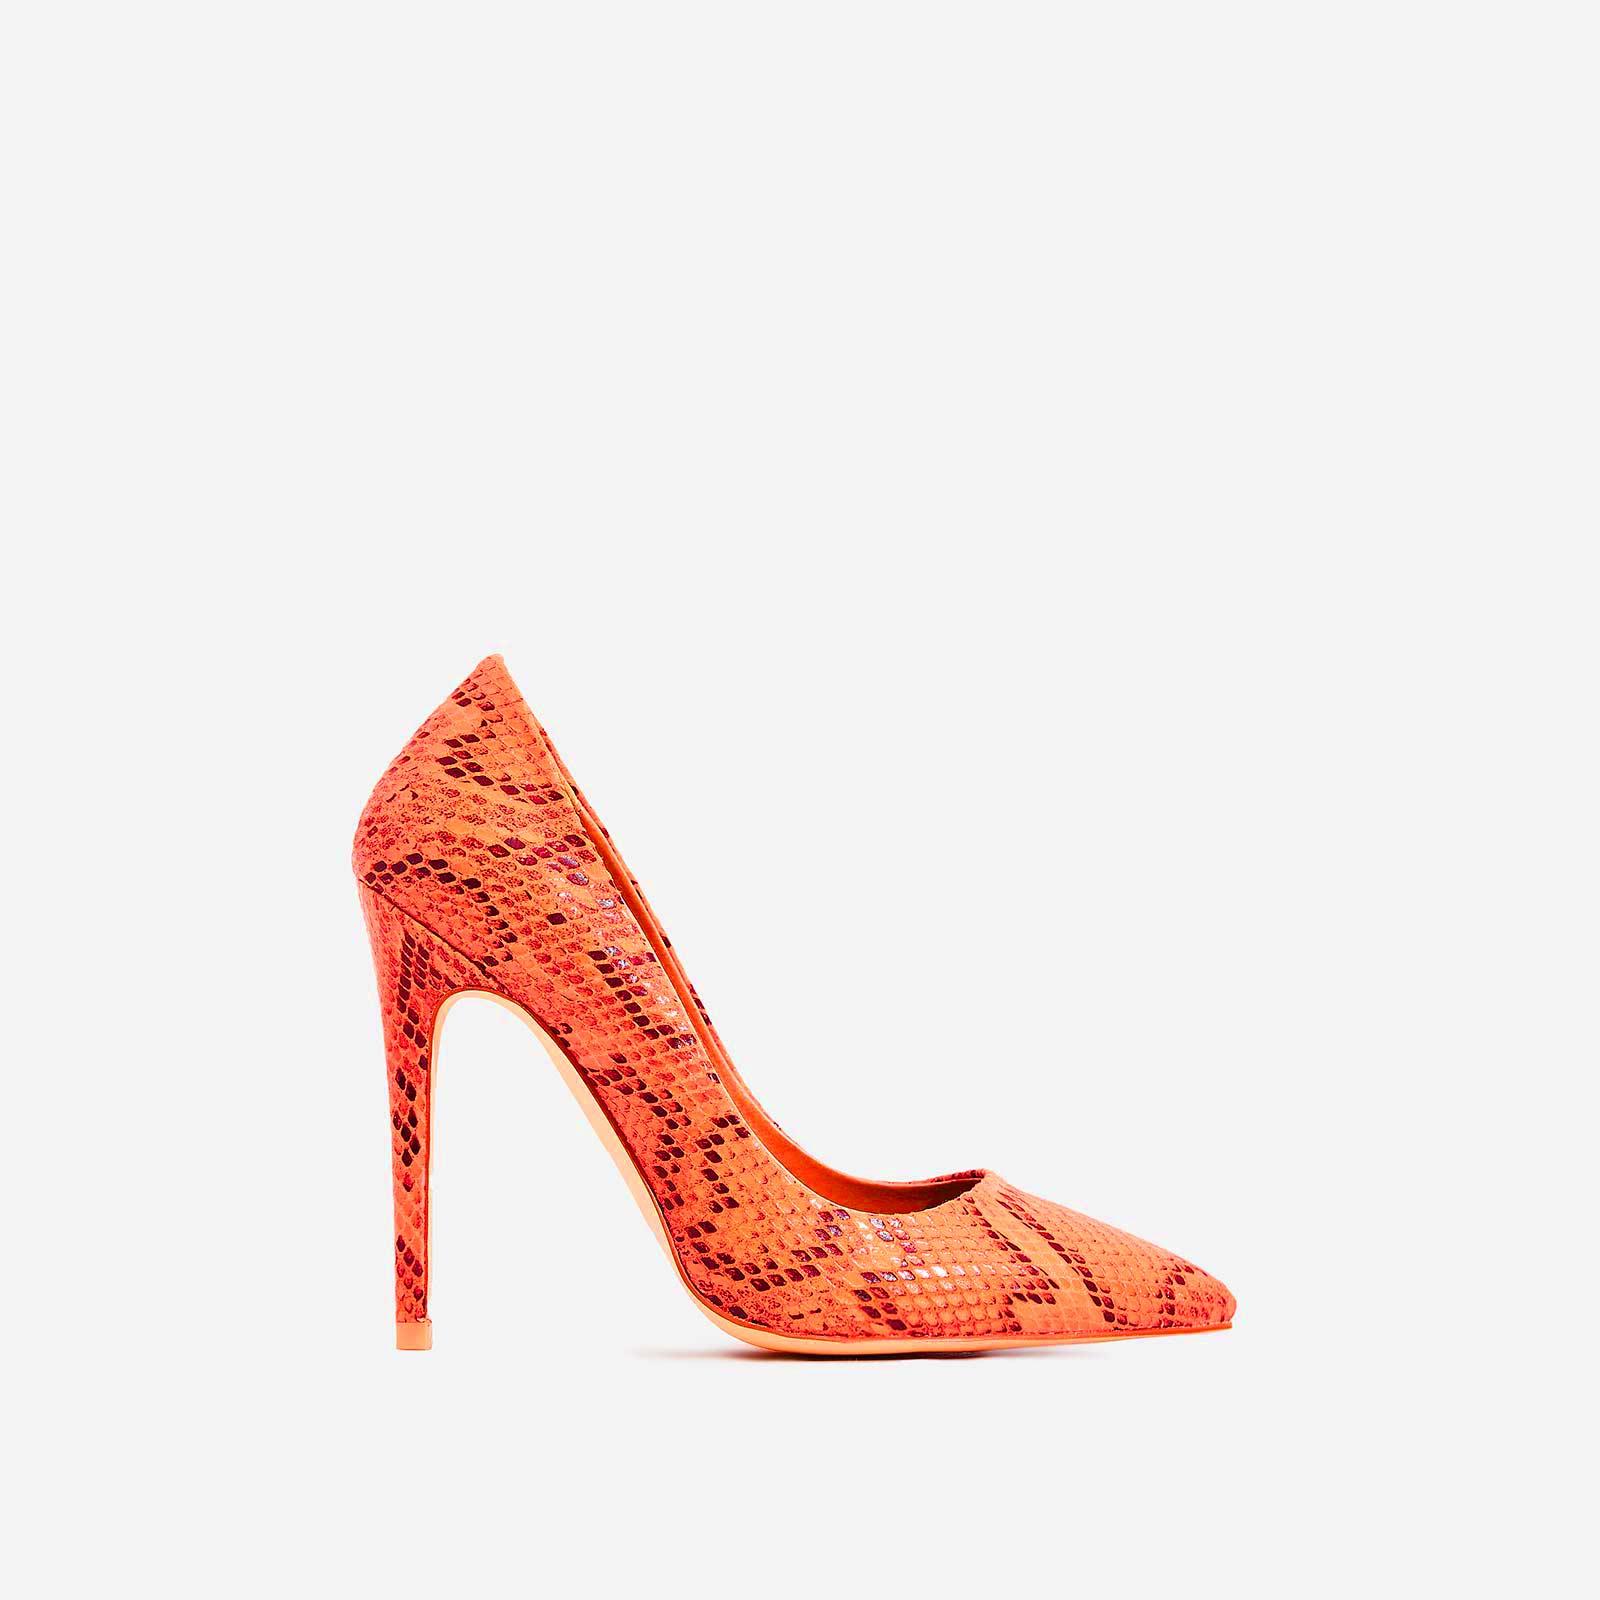 Bronte Court Heel In Neon Orange Snake Print Faux Leather